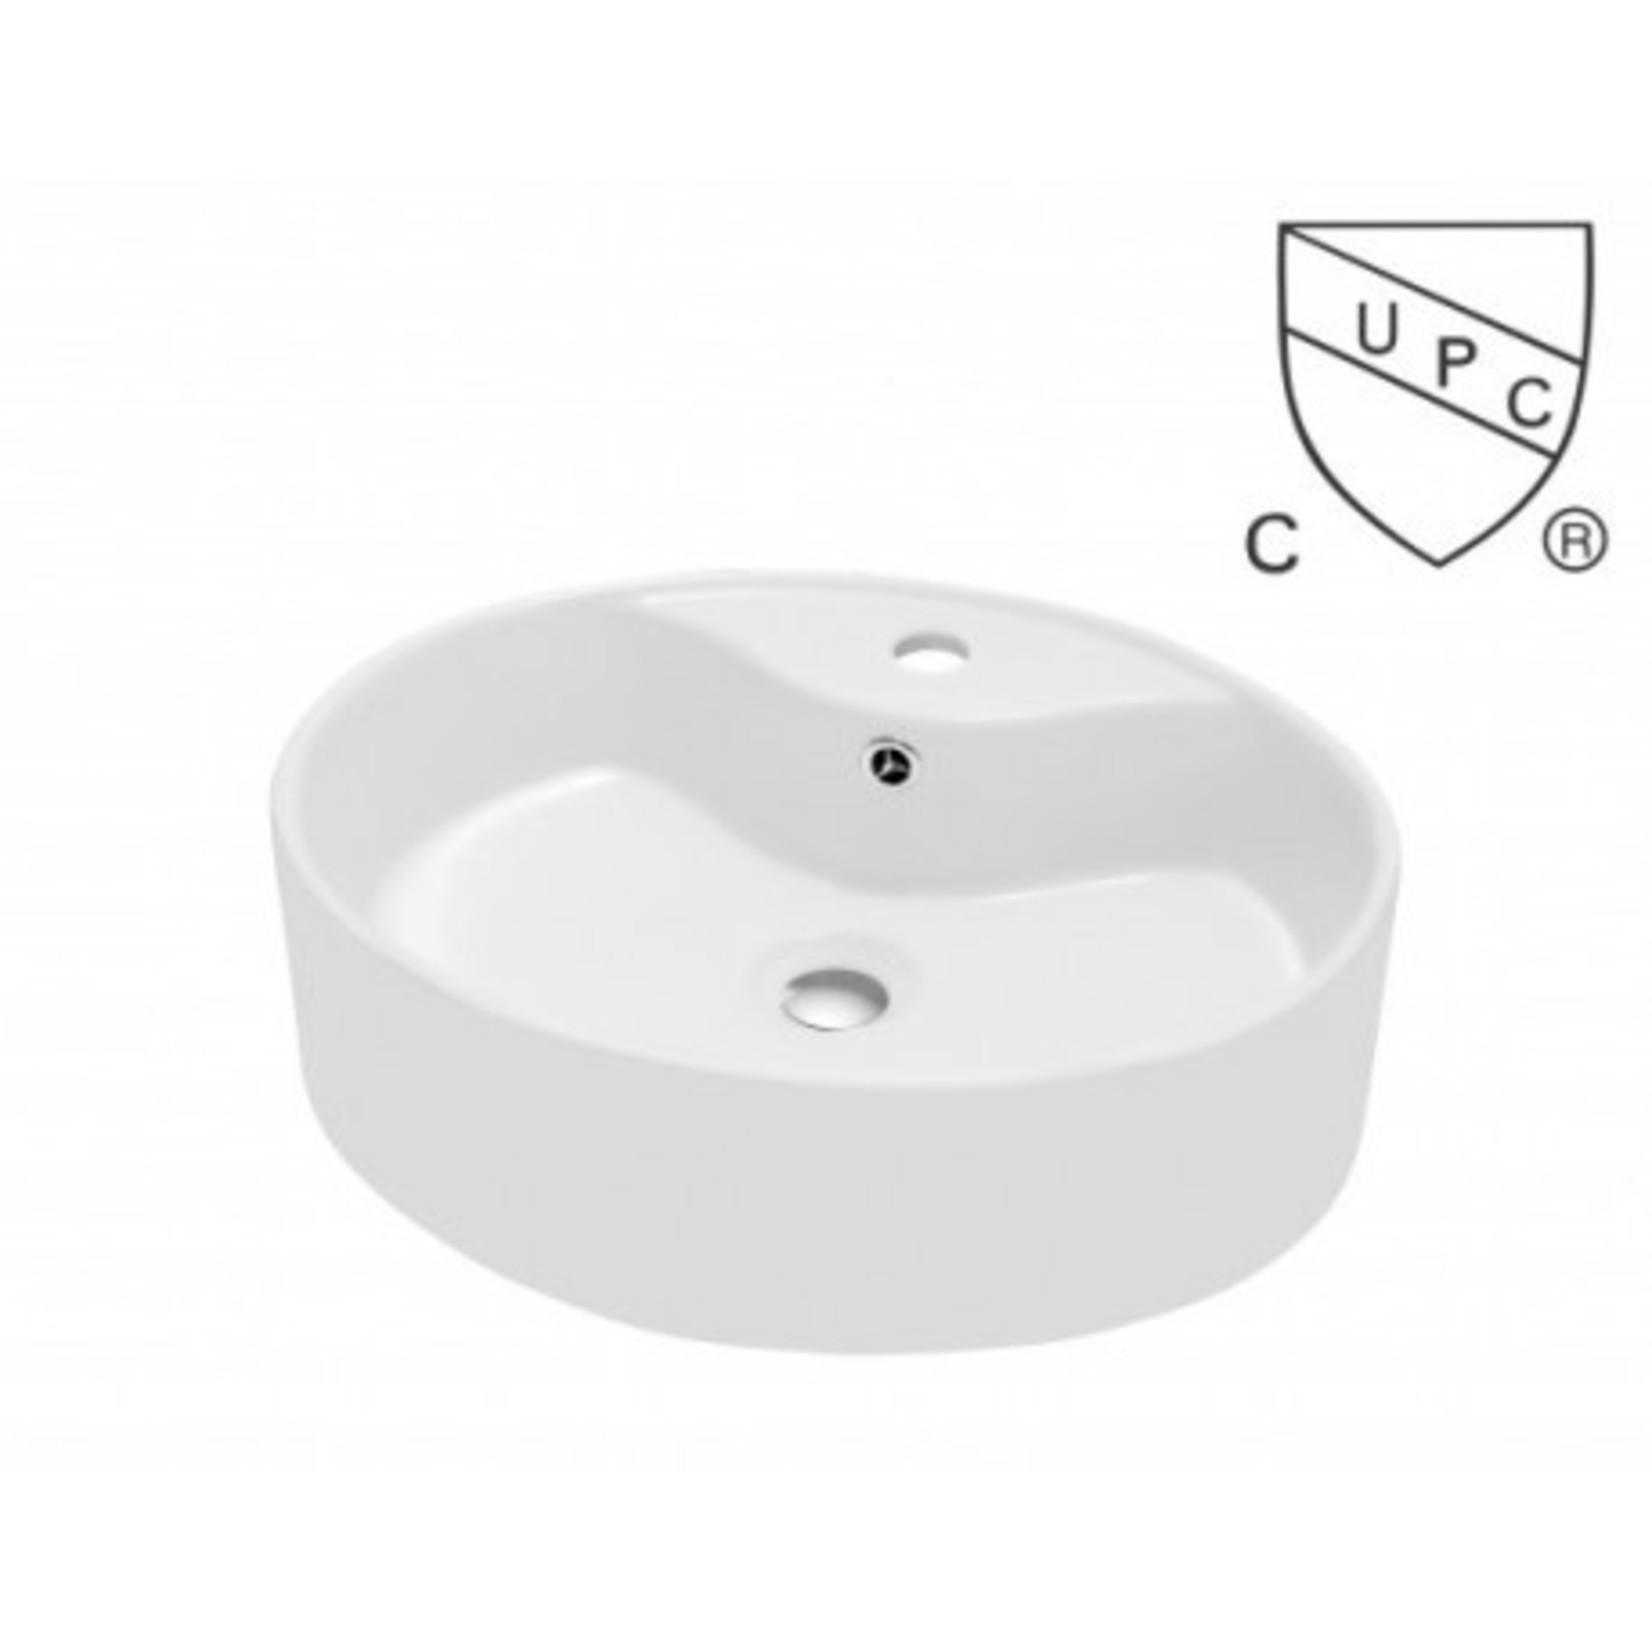 Porcelain washbasin S-600